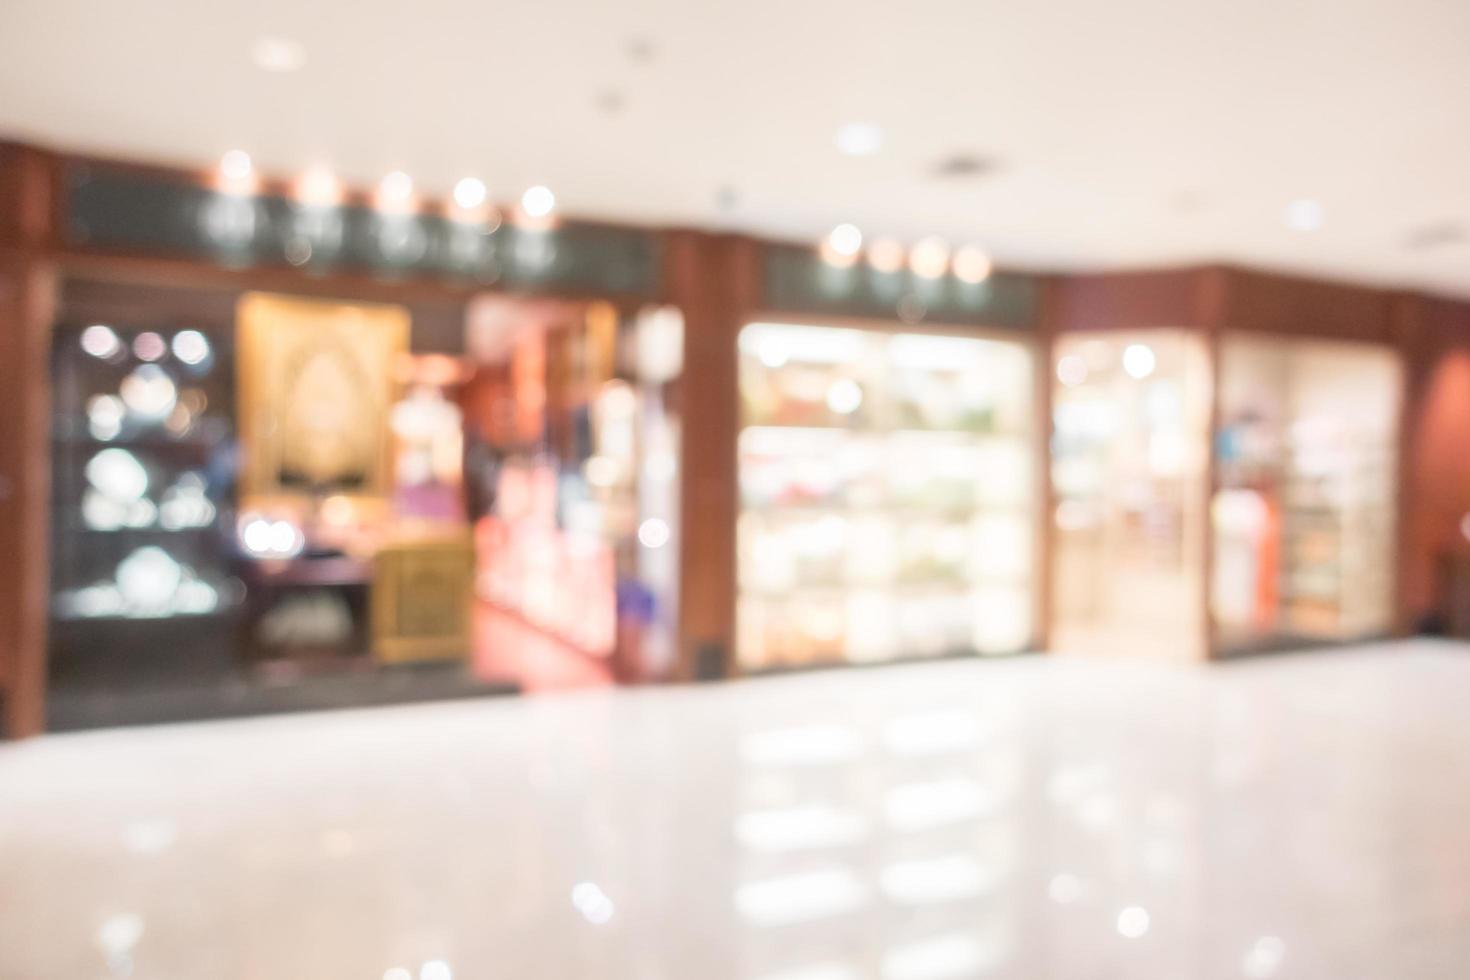 abstrakt oskärpa lobby foto